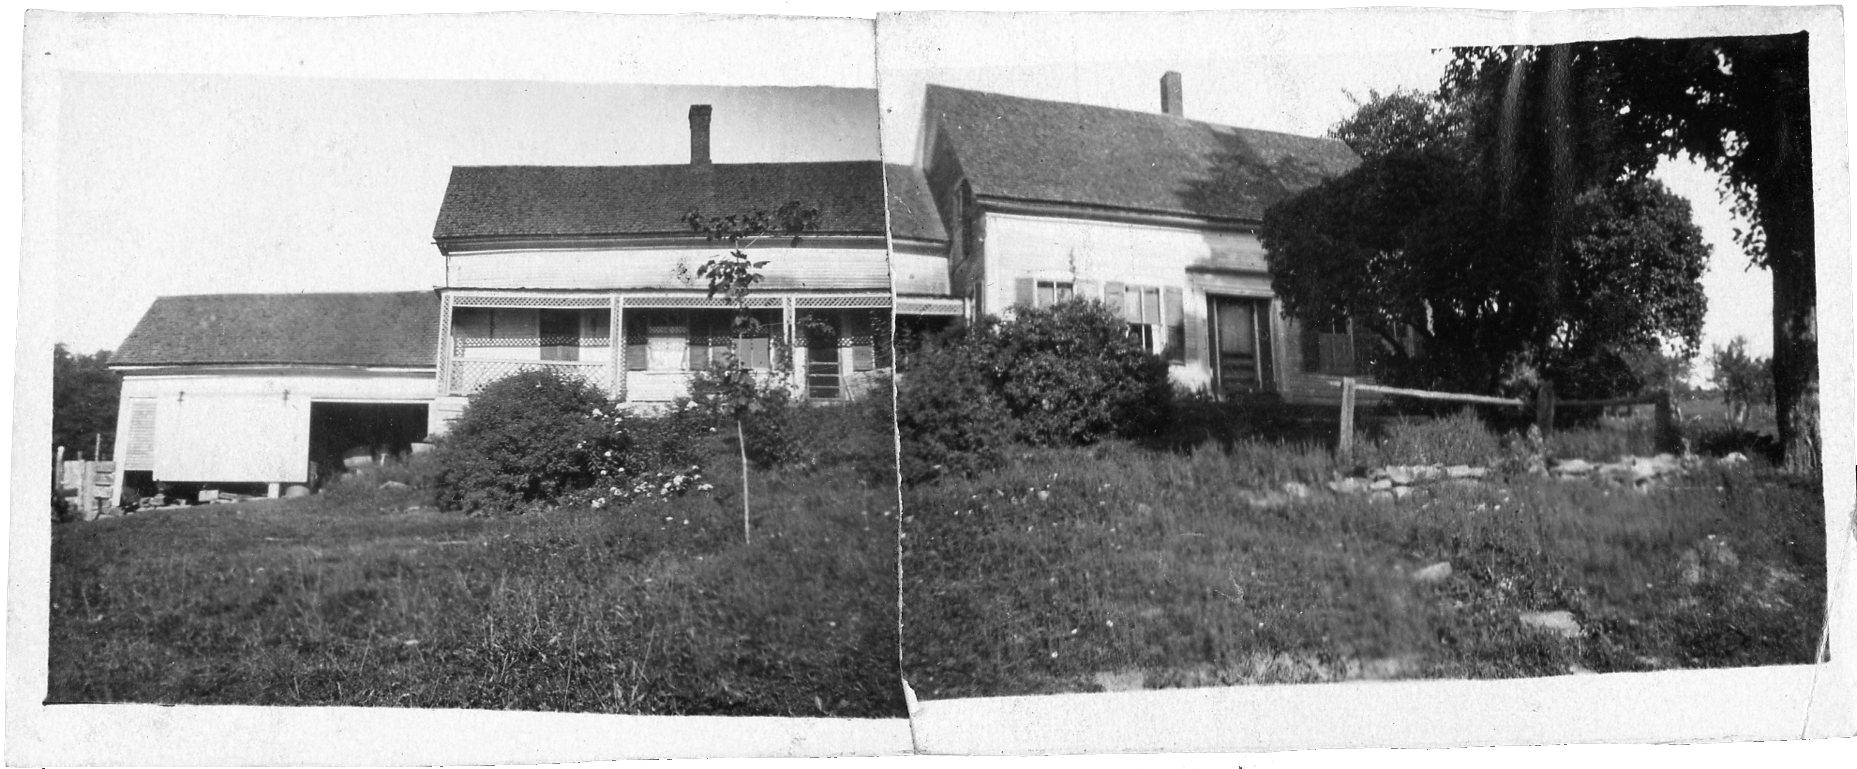 Flint_homestead_Bent_Hil594 copy.jpg